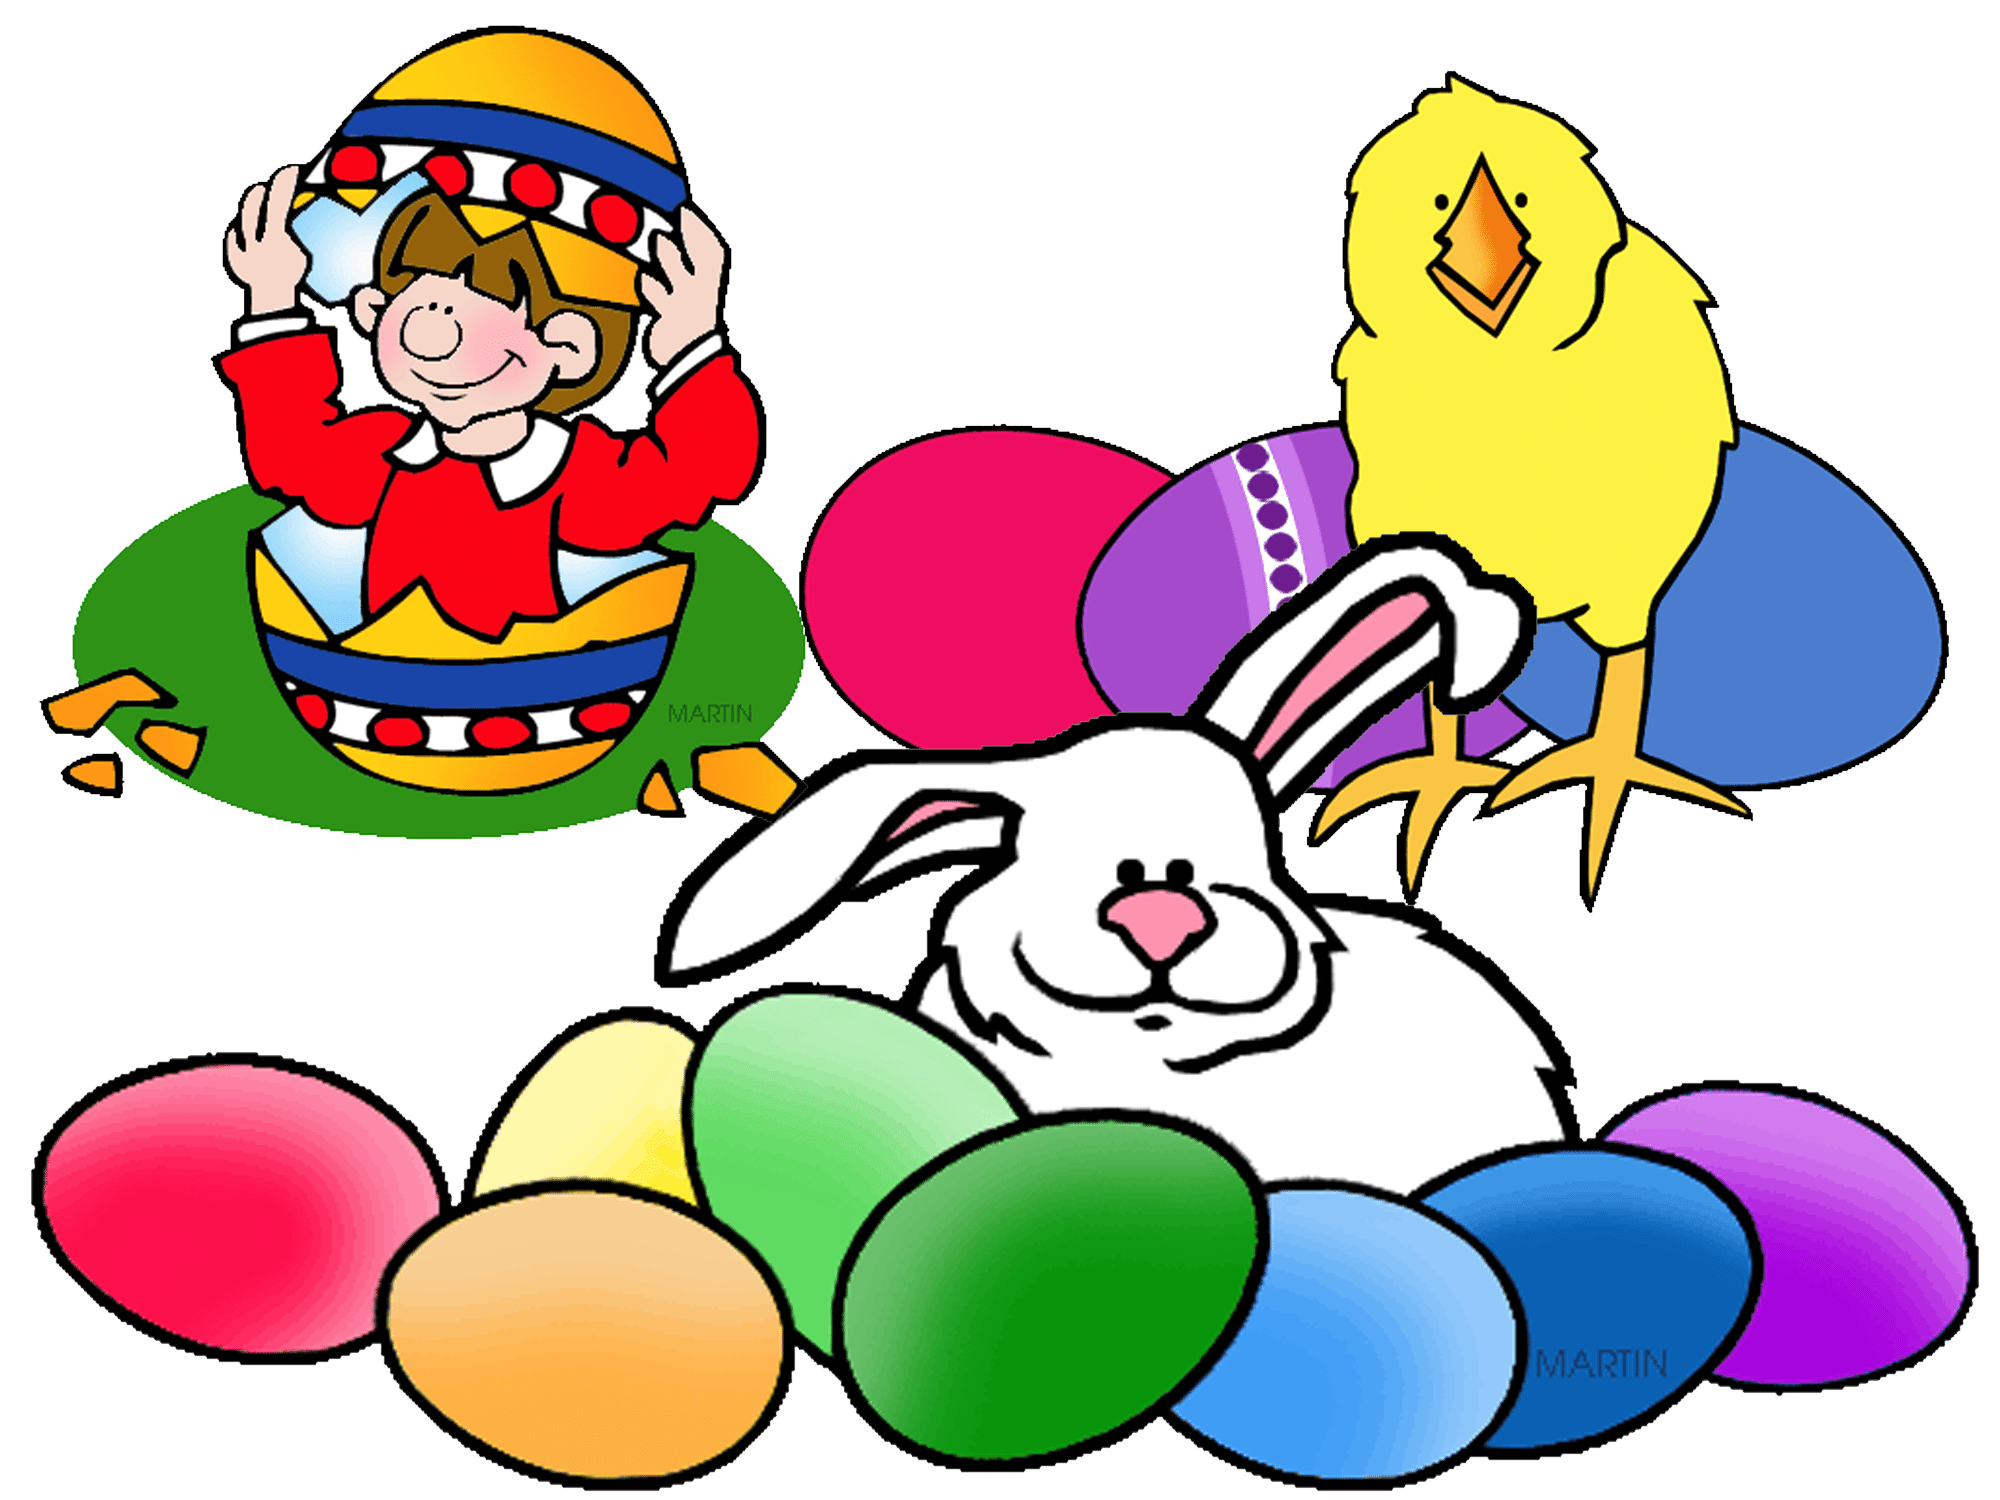 2000x1500 Phillip Martin Clip Art Easter Bunnies Counter Christmas Photo